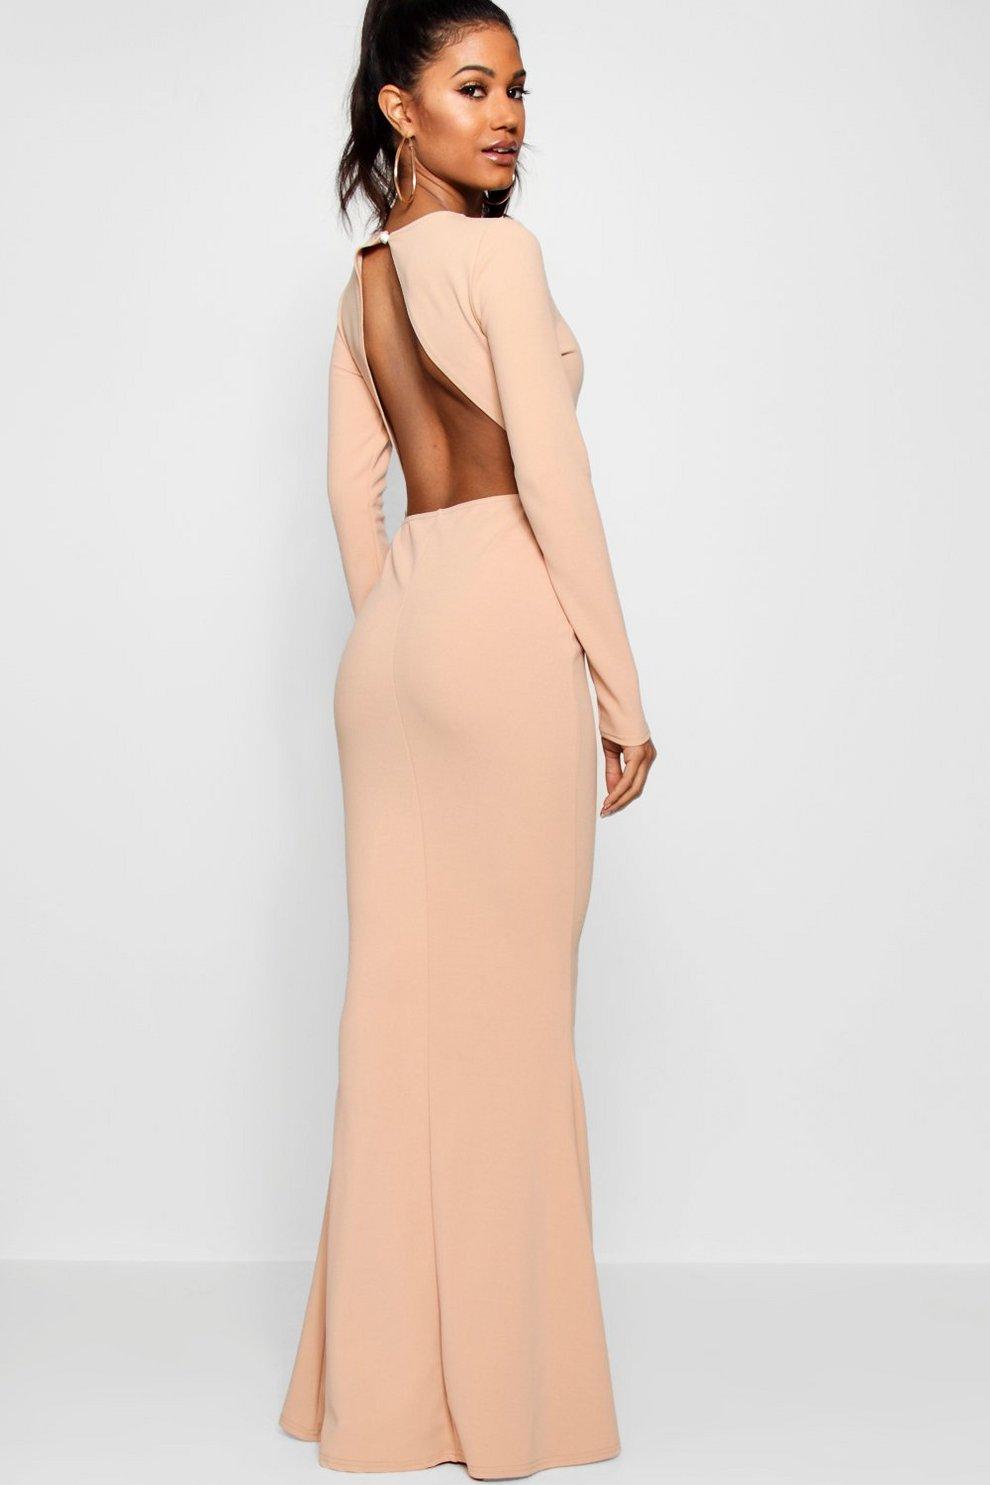 Long Sleeve Open Back Maxi Dress | Boohoo